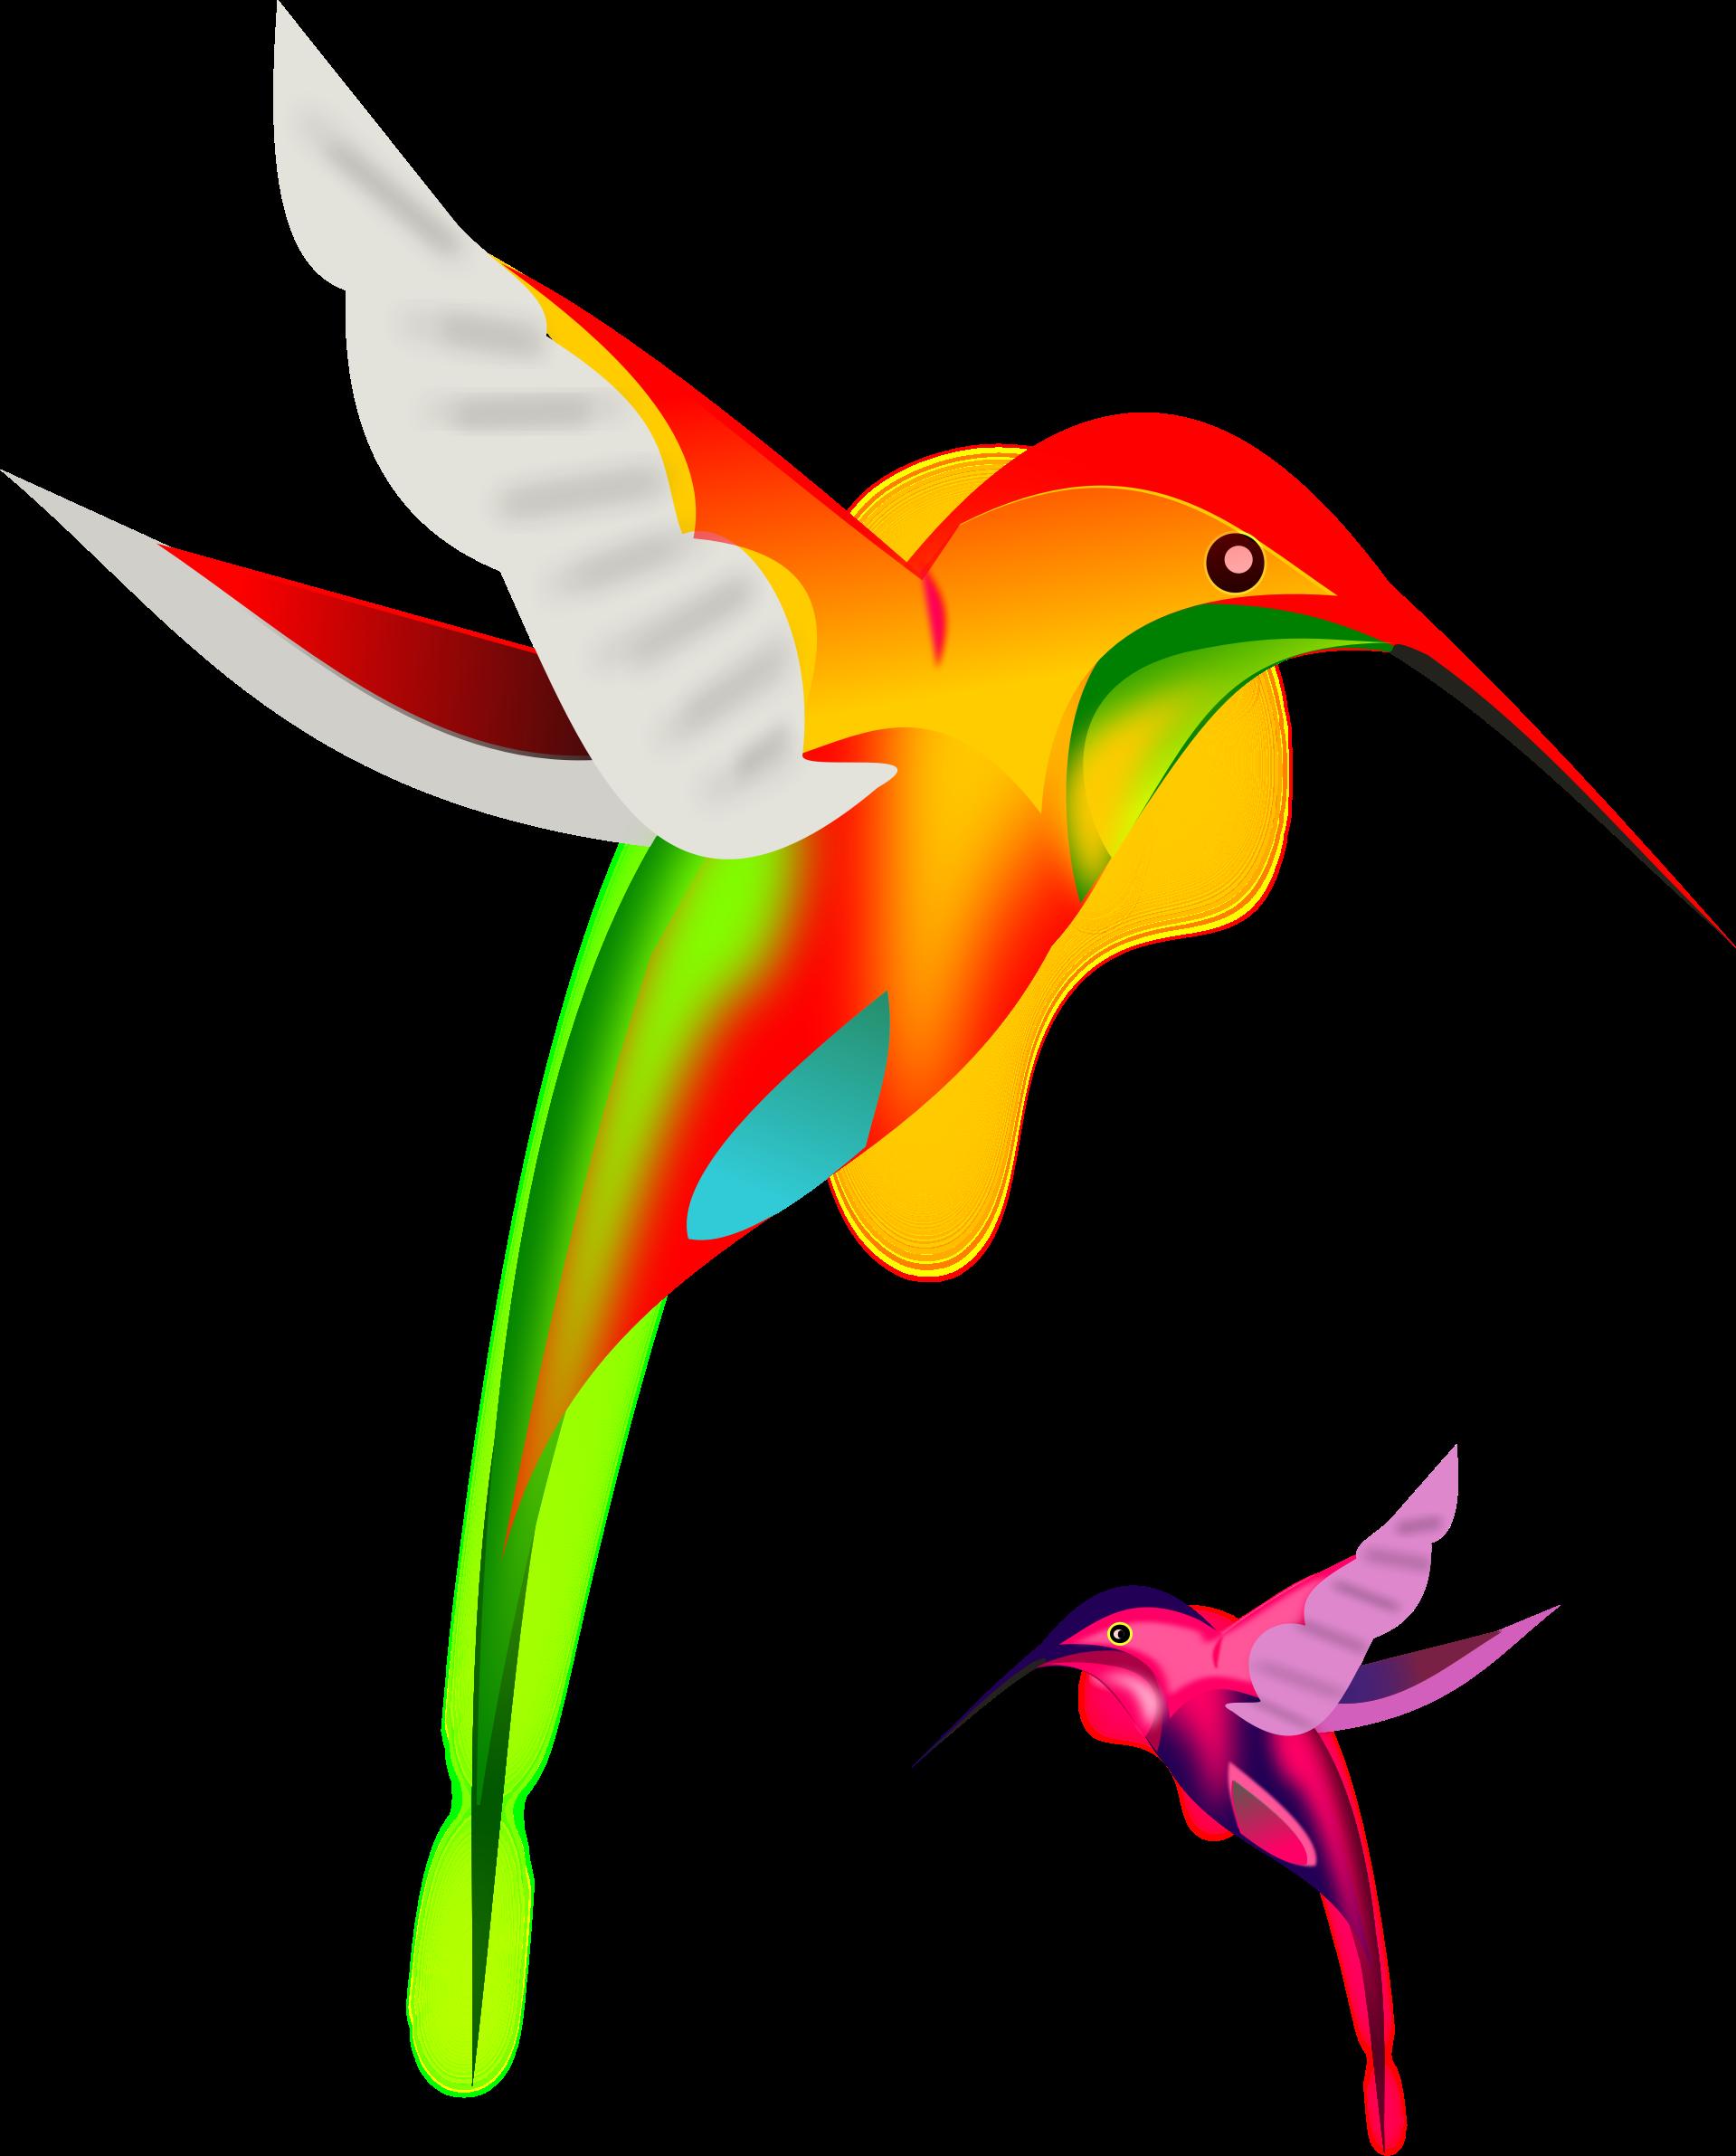 Clipart birds paradise. Colibri by gurica hummingbirds